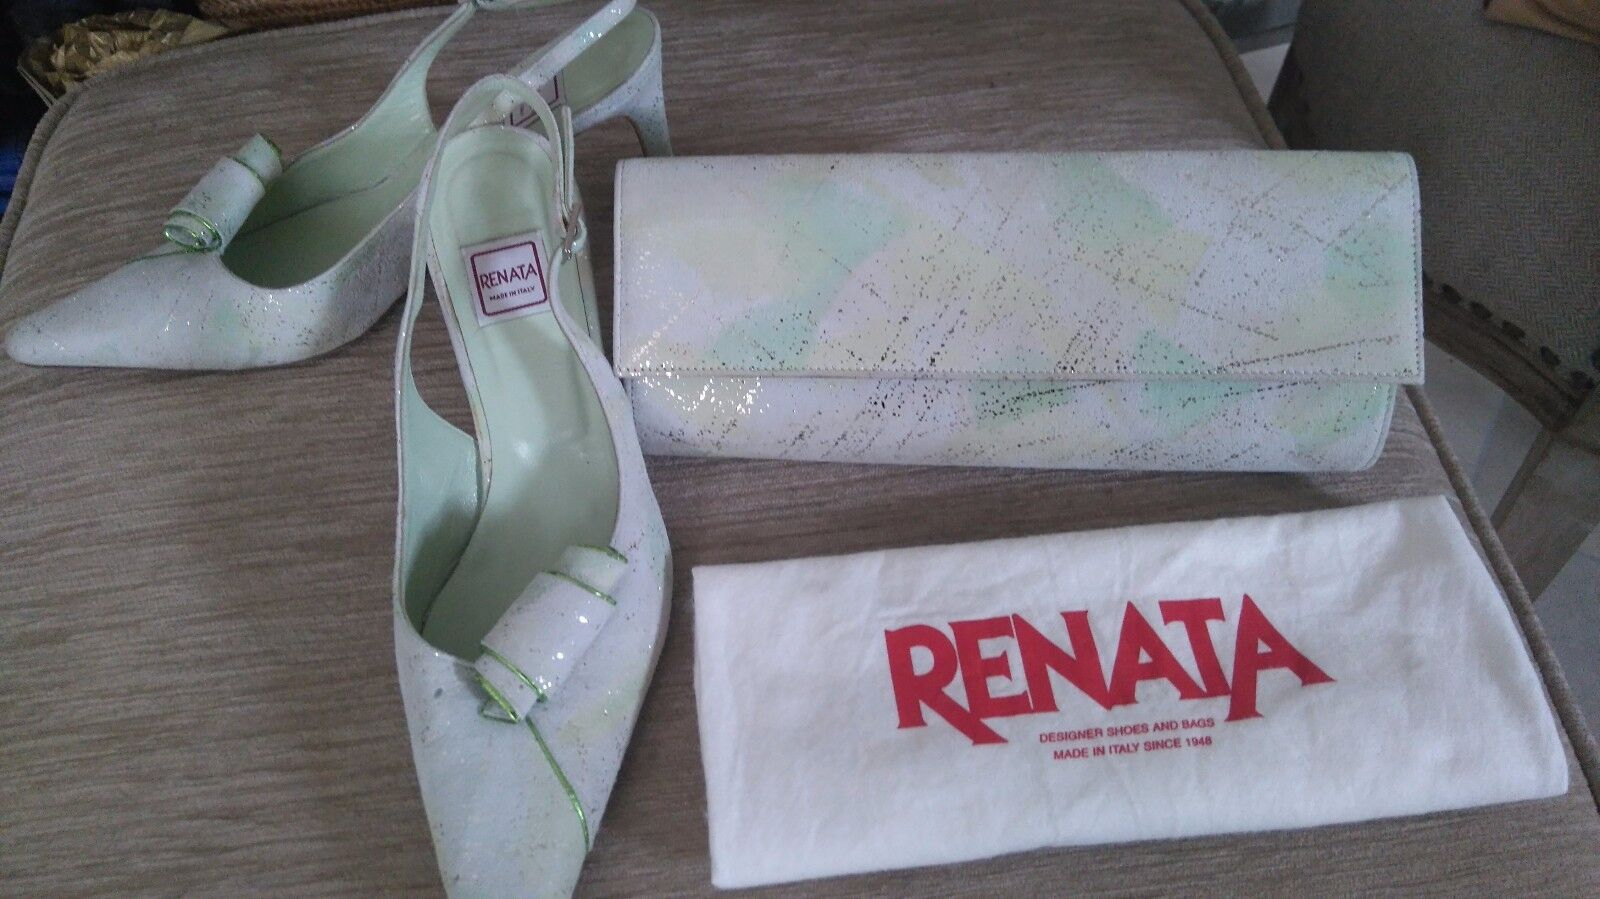 RENATA Schuhes and Bag Soft Lime Dance Größe 40.5 Wedding, Cruise, Dance Lime f08e2a